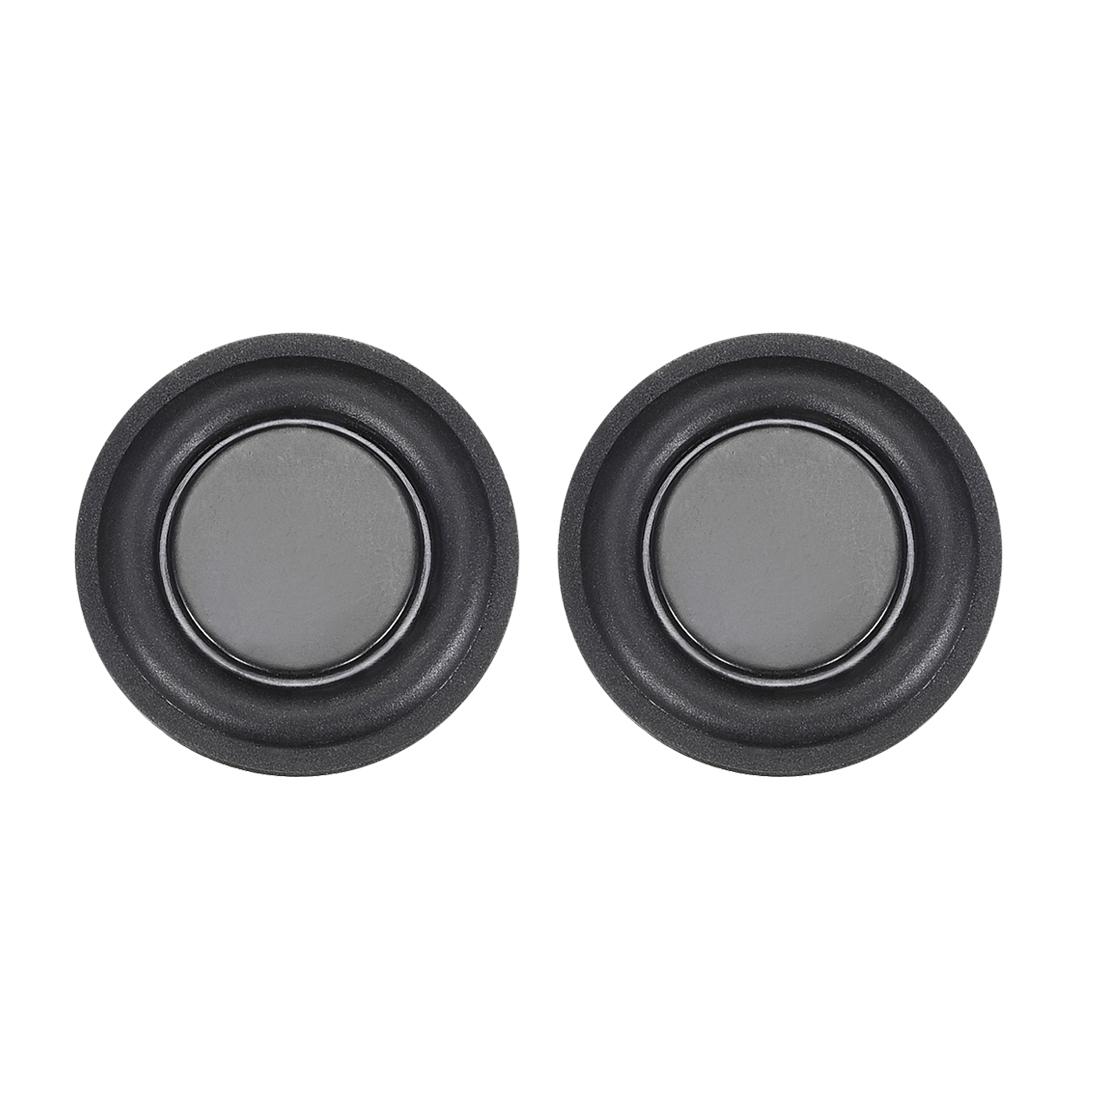 "2Pcs 1.25"" 32mm Bass Speaker Passive Radiator Rubber Vibration Plate DIY Repair"